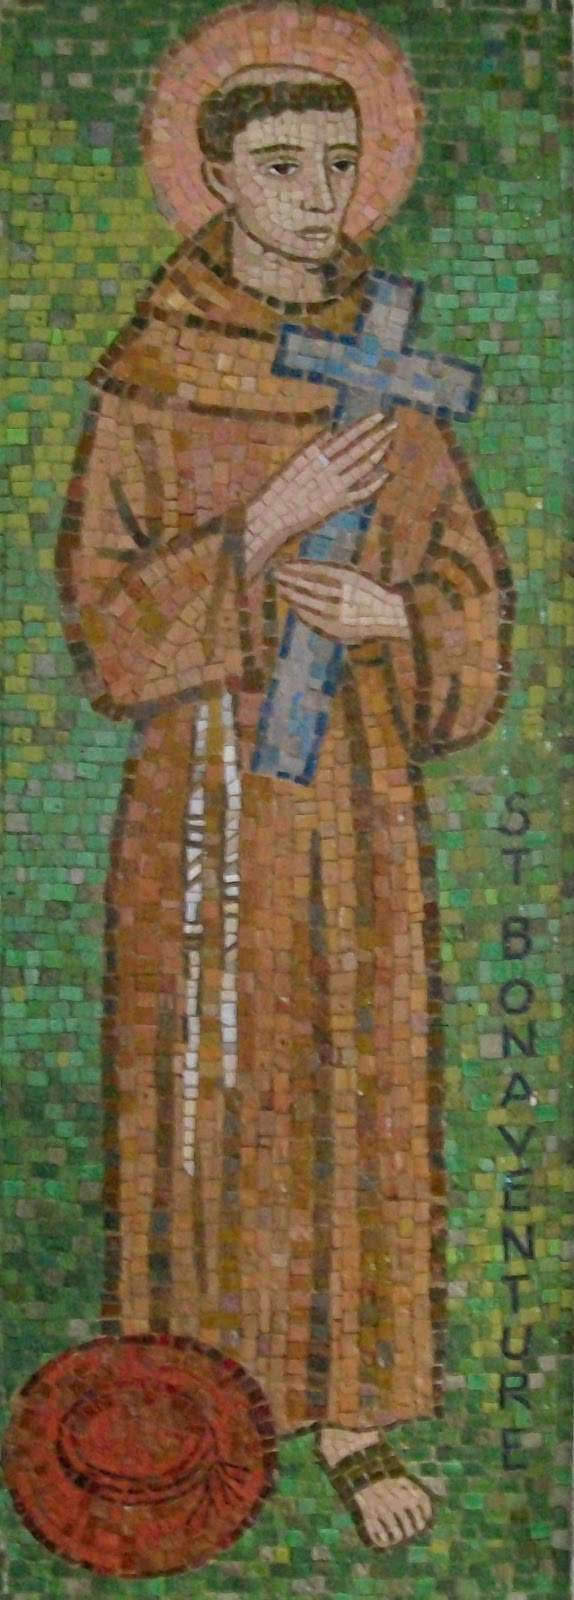 St. Bonaventure - A Saint of Intelligence and Peace